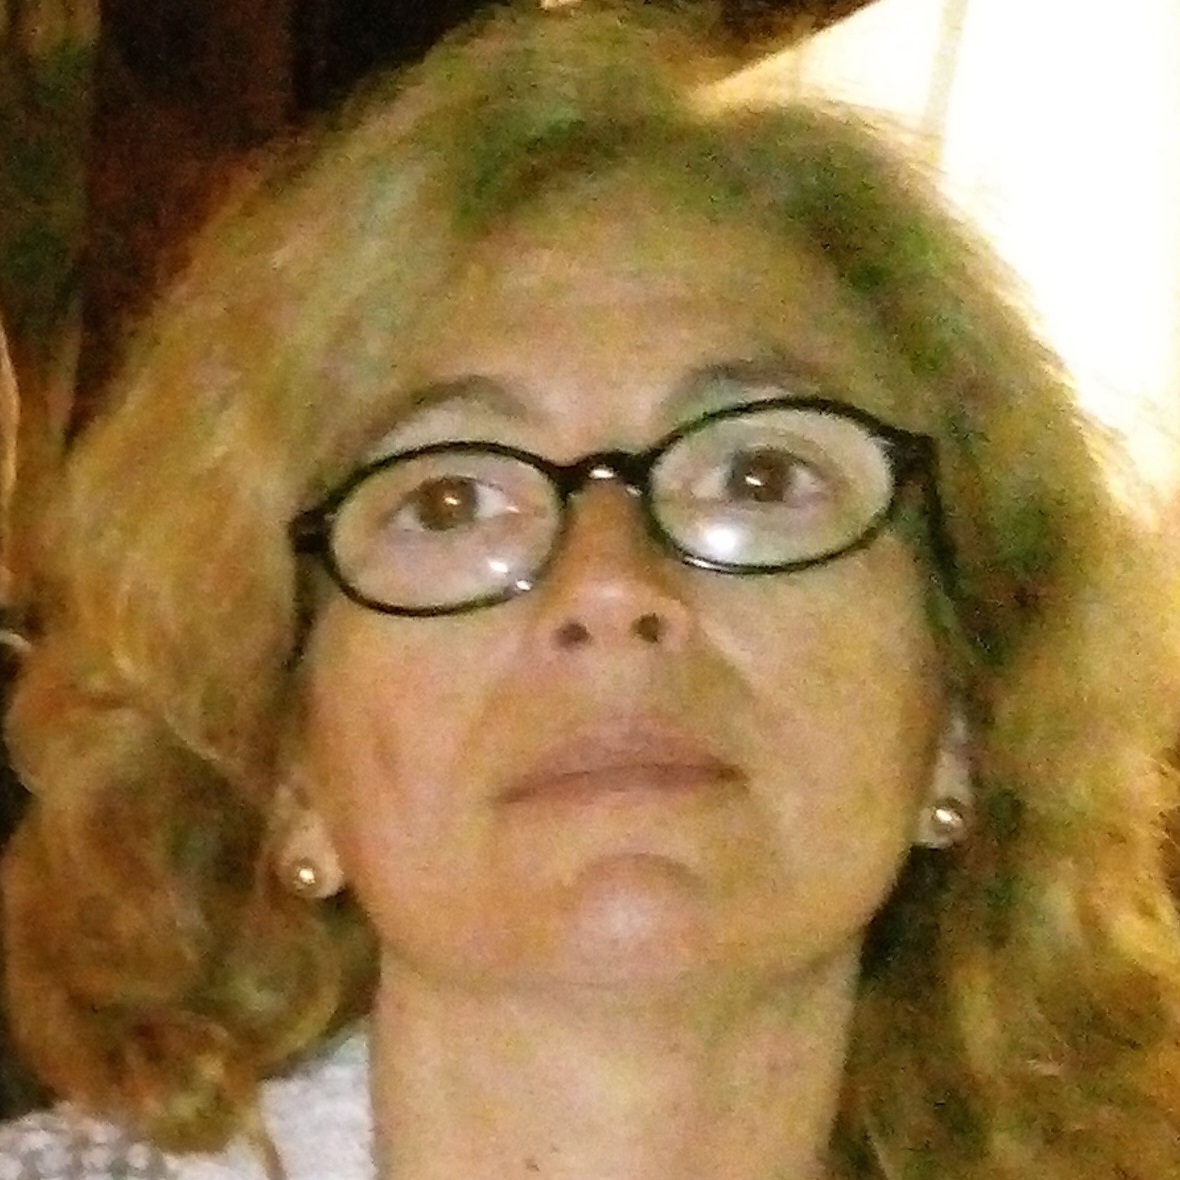 Susana de garcia das land bordel part 01 - 3 part 9